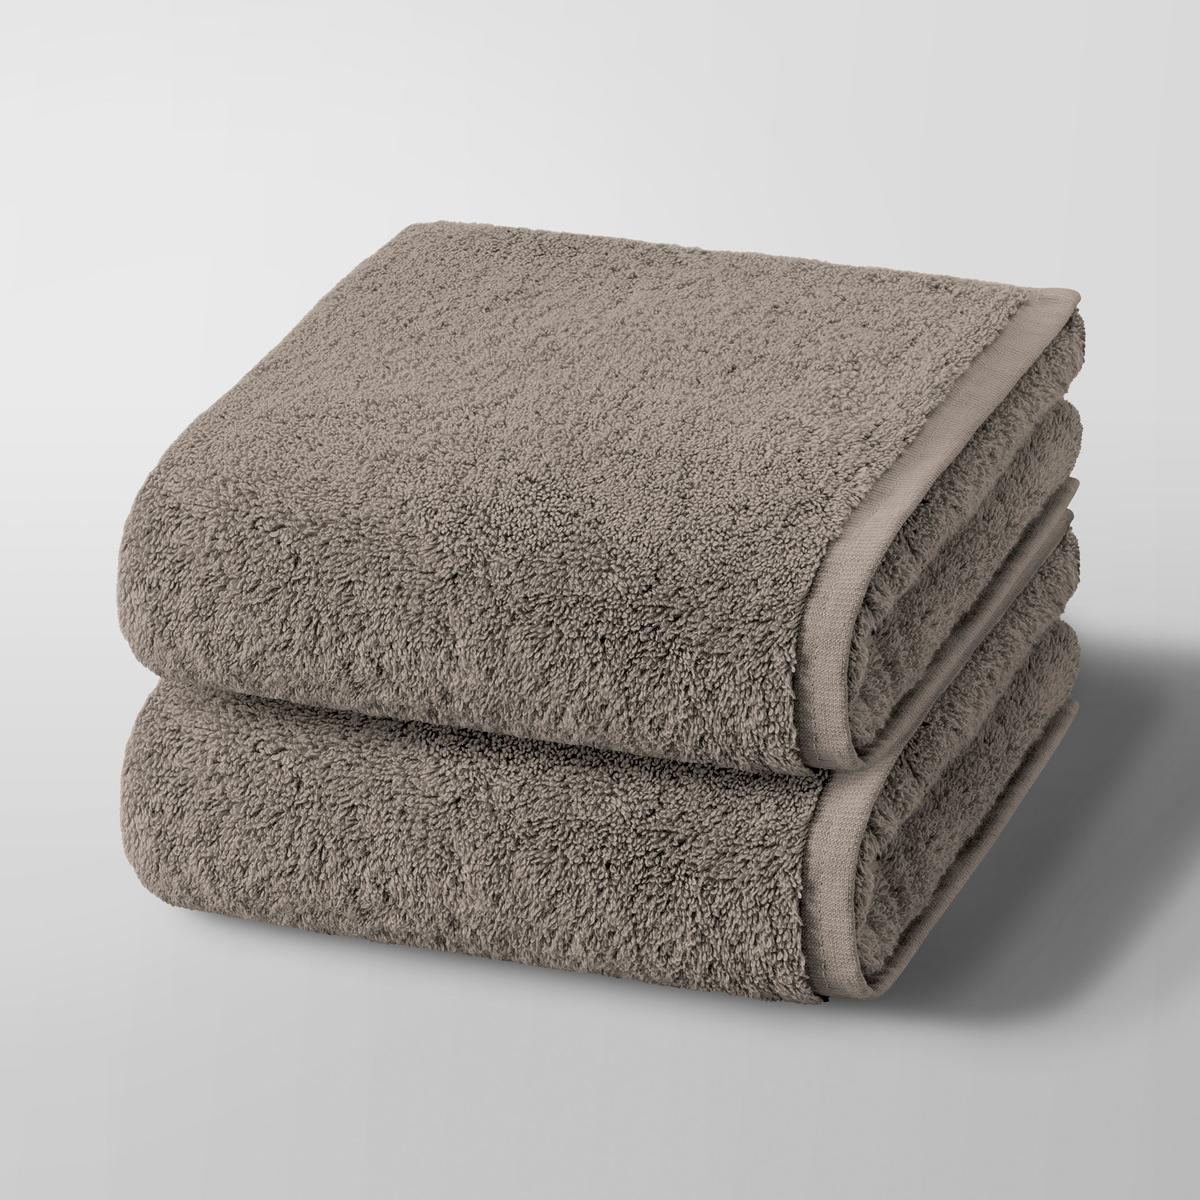 2 полотенца Gilbear, 100% хлопок